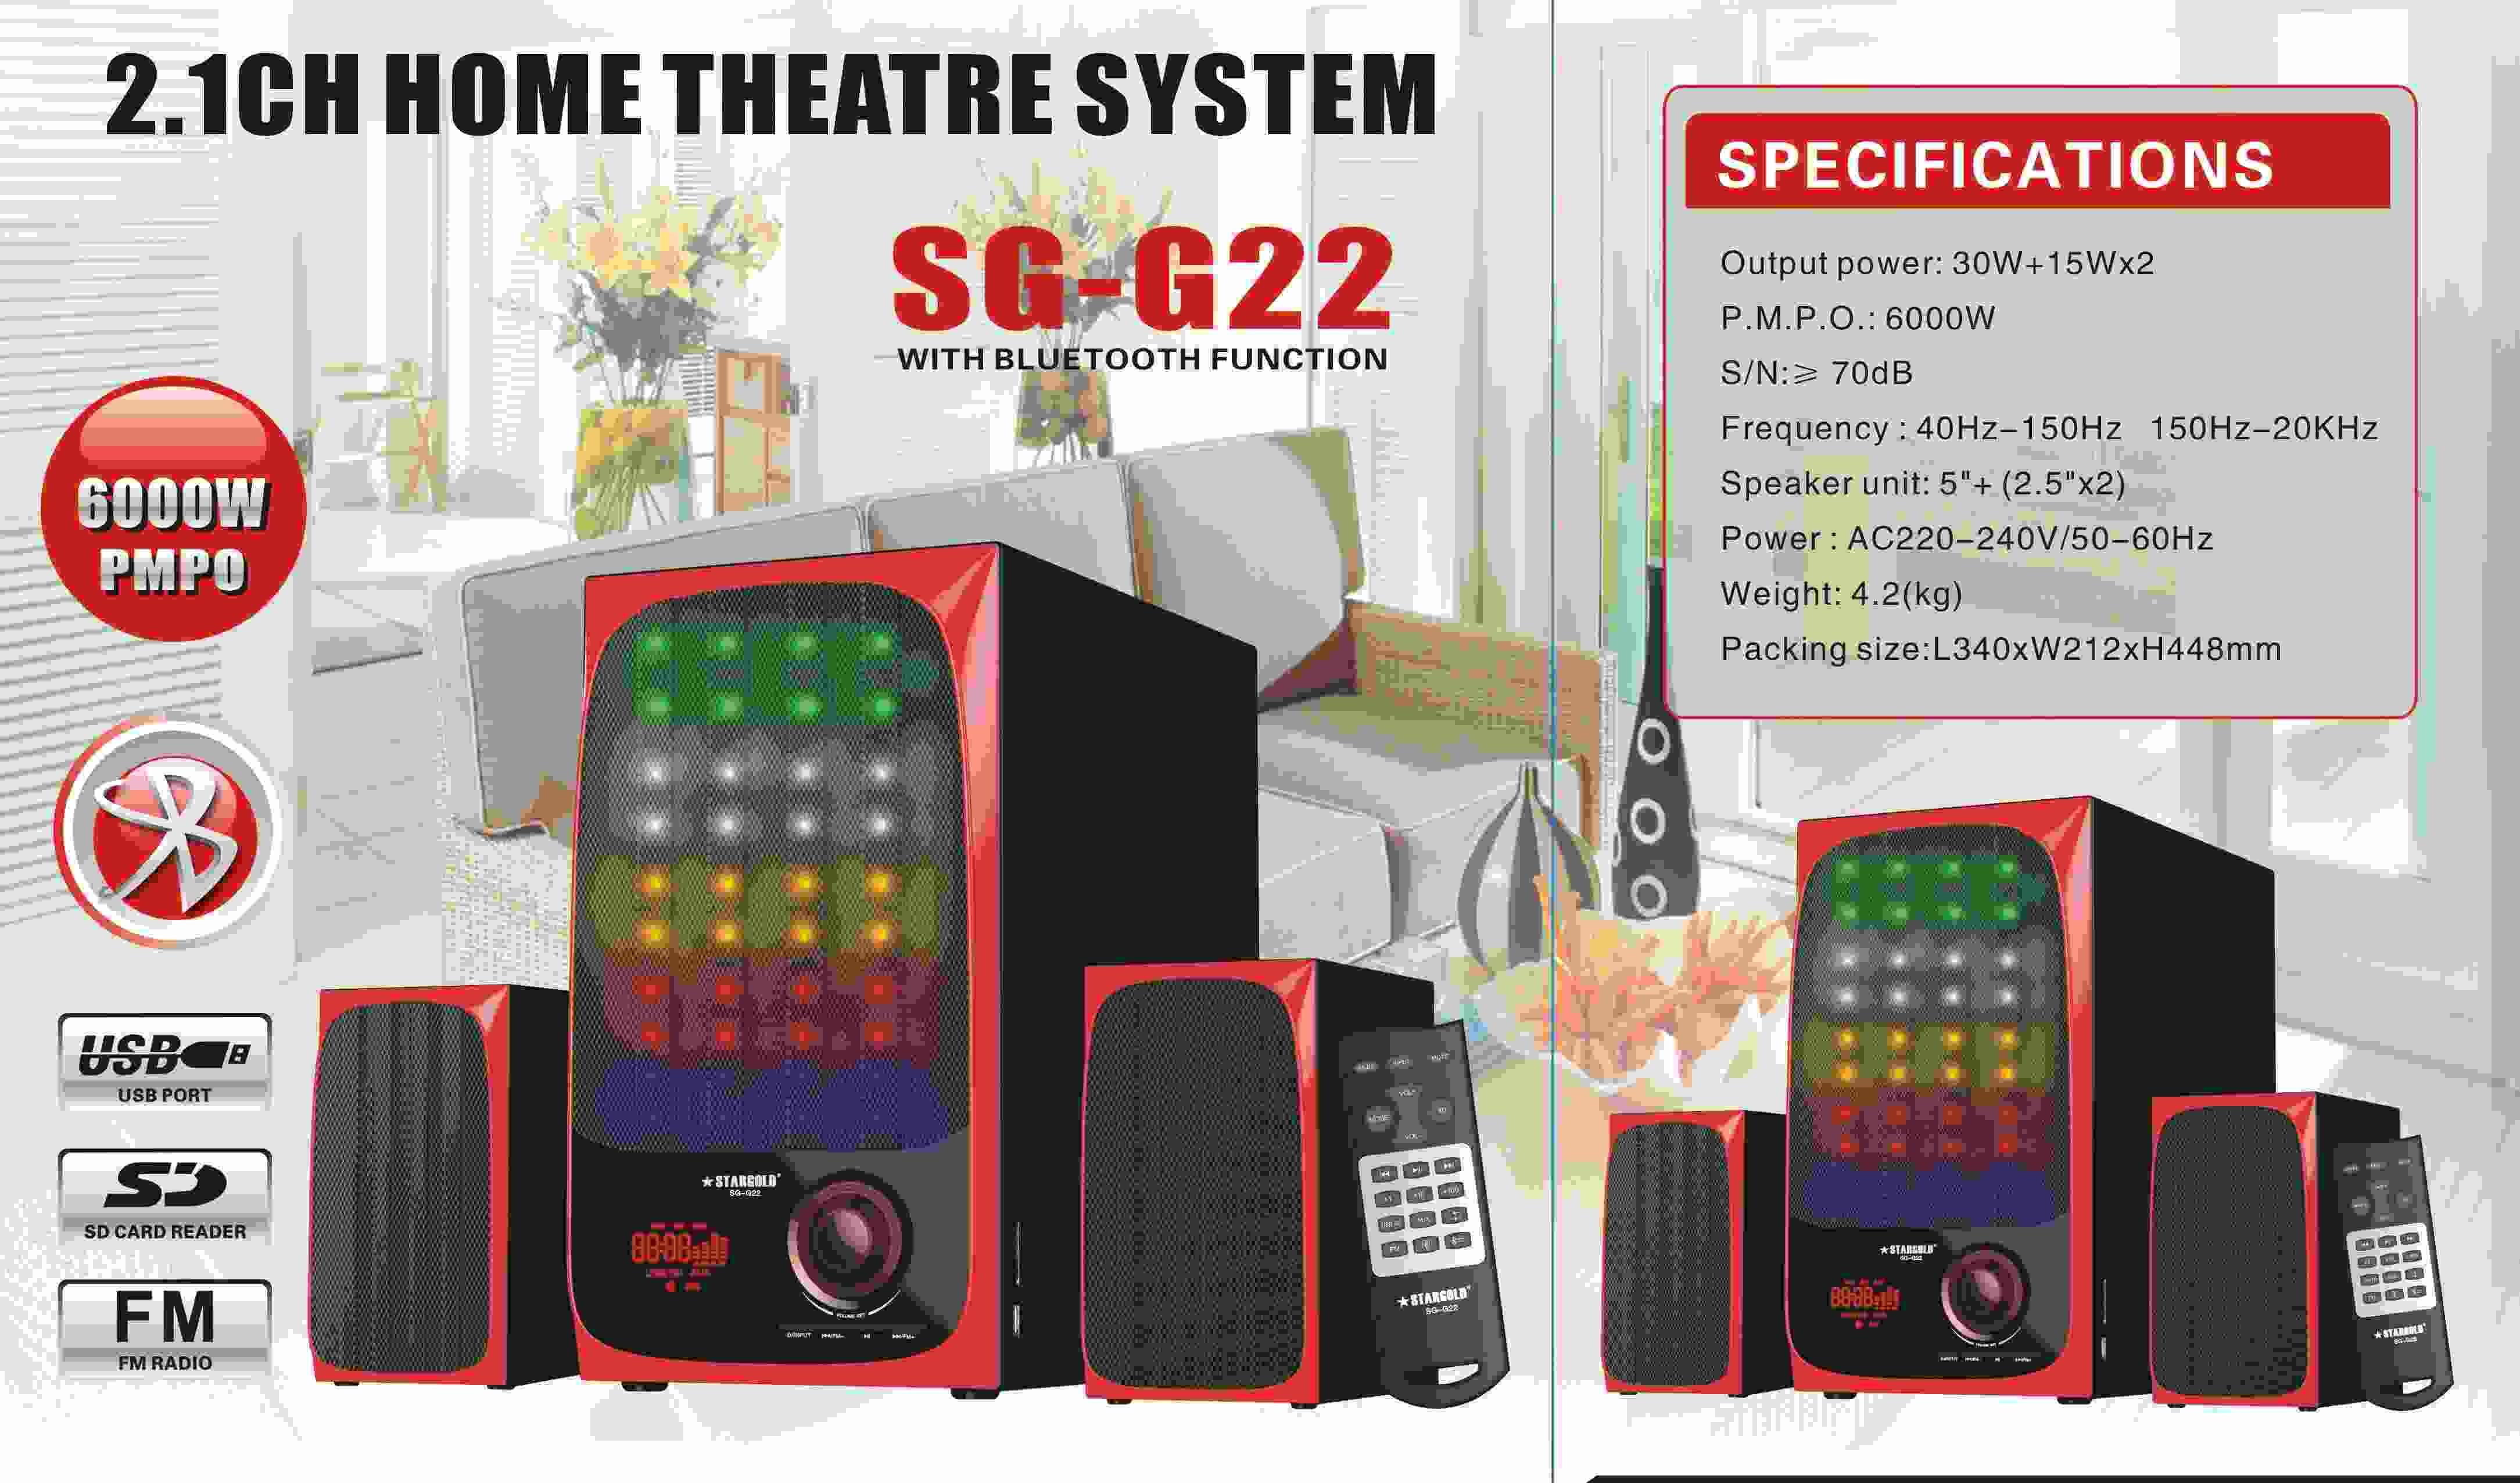 Stargold 2.1ch Home Theatre System SG-G22